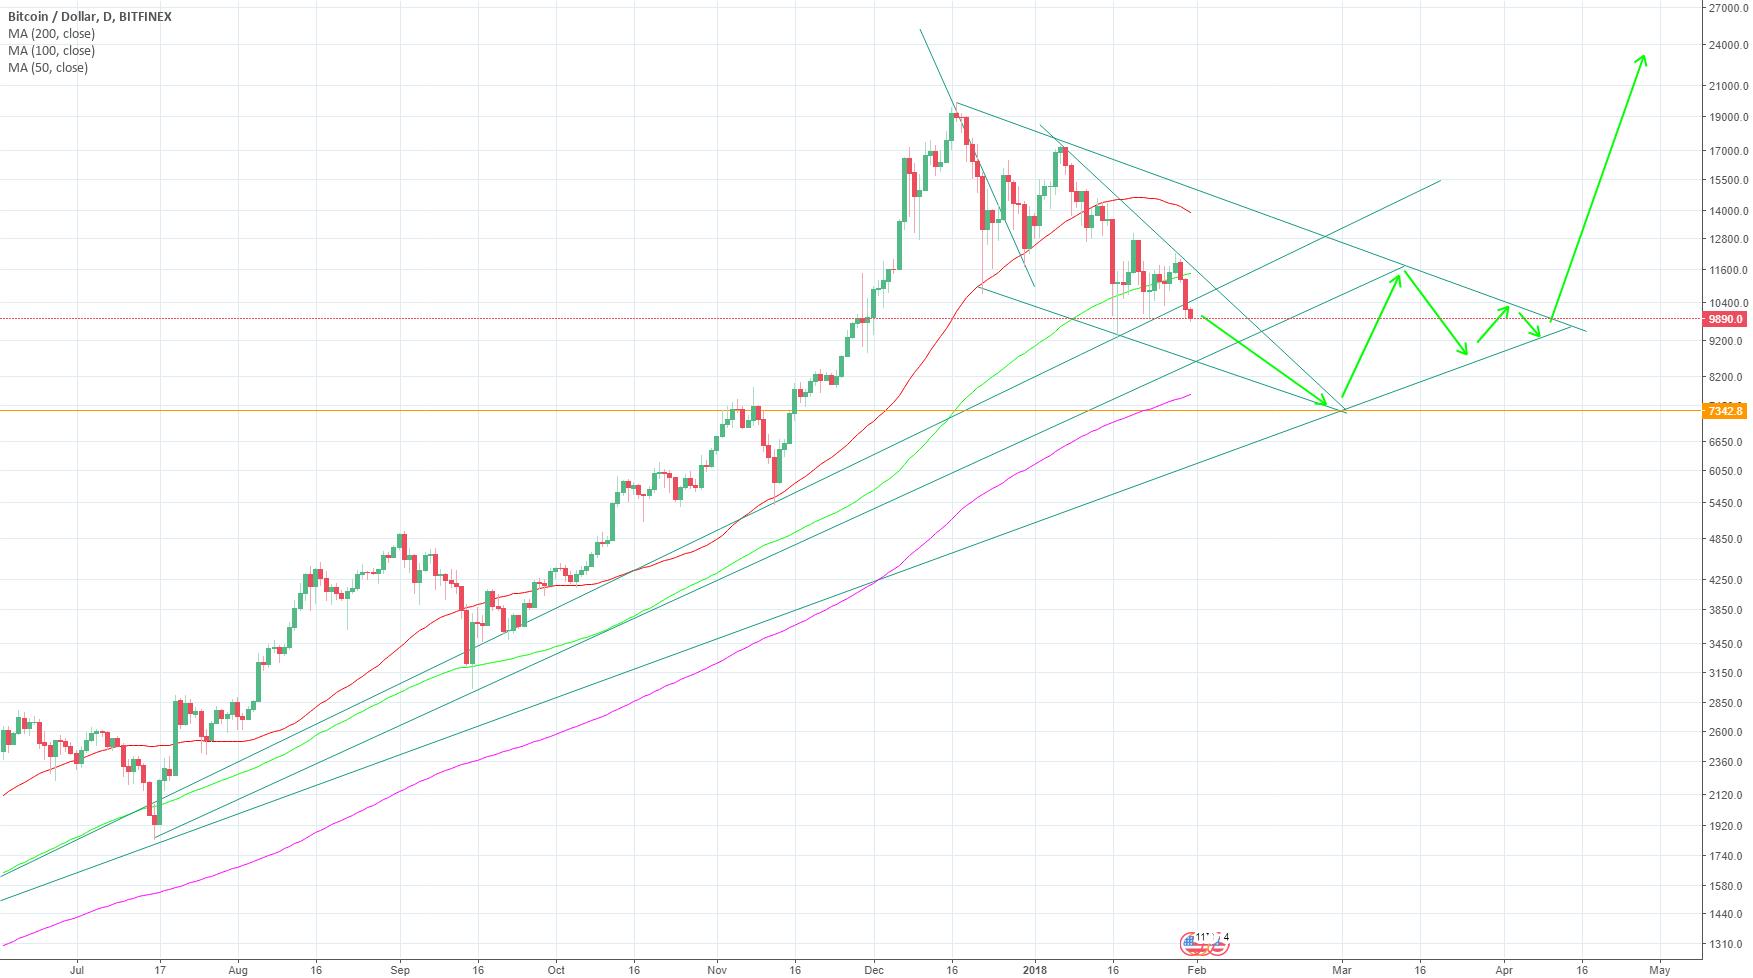 BTC price drop to 6,5-7,5k in SHORT TERM!